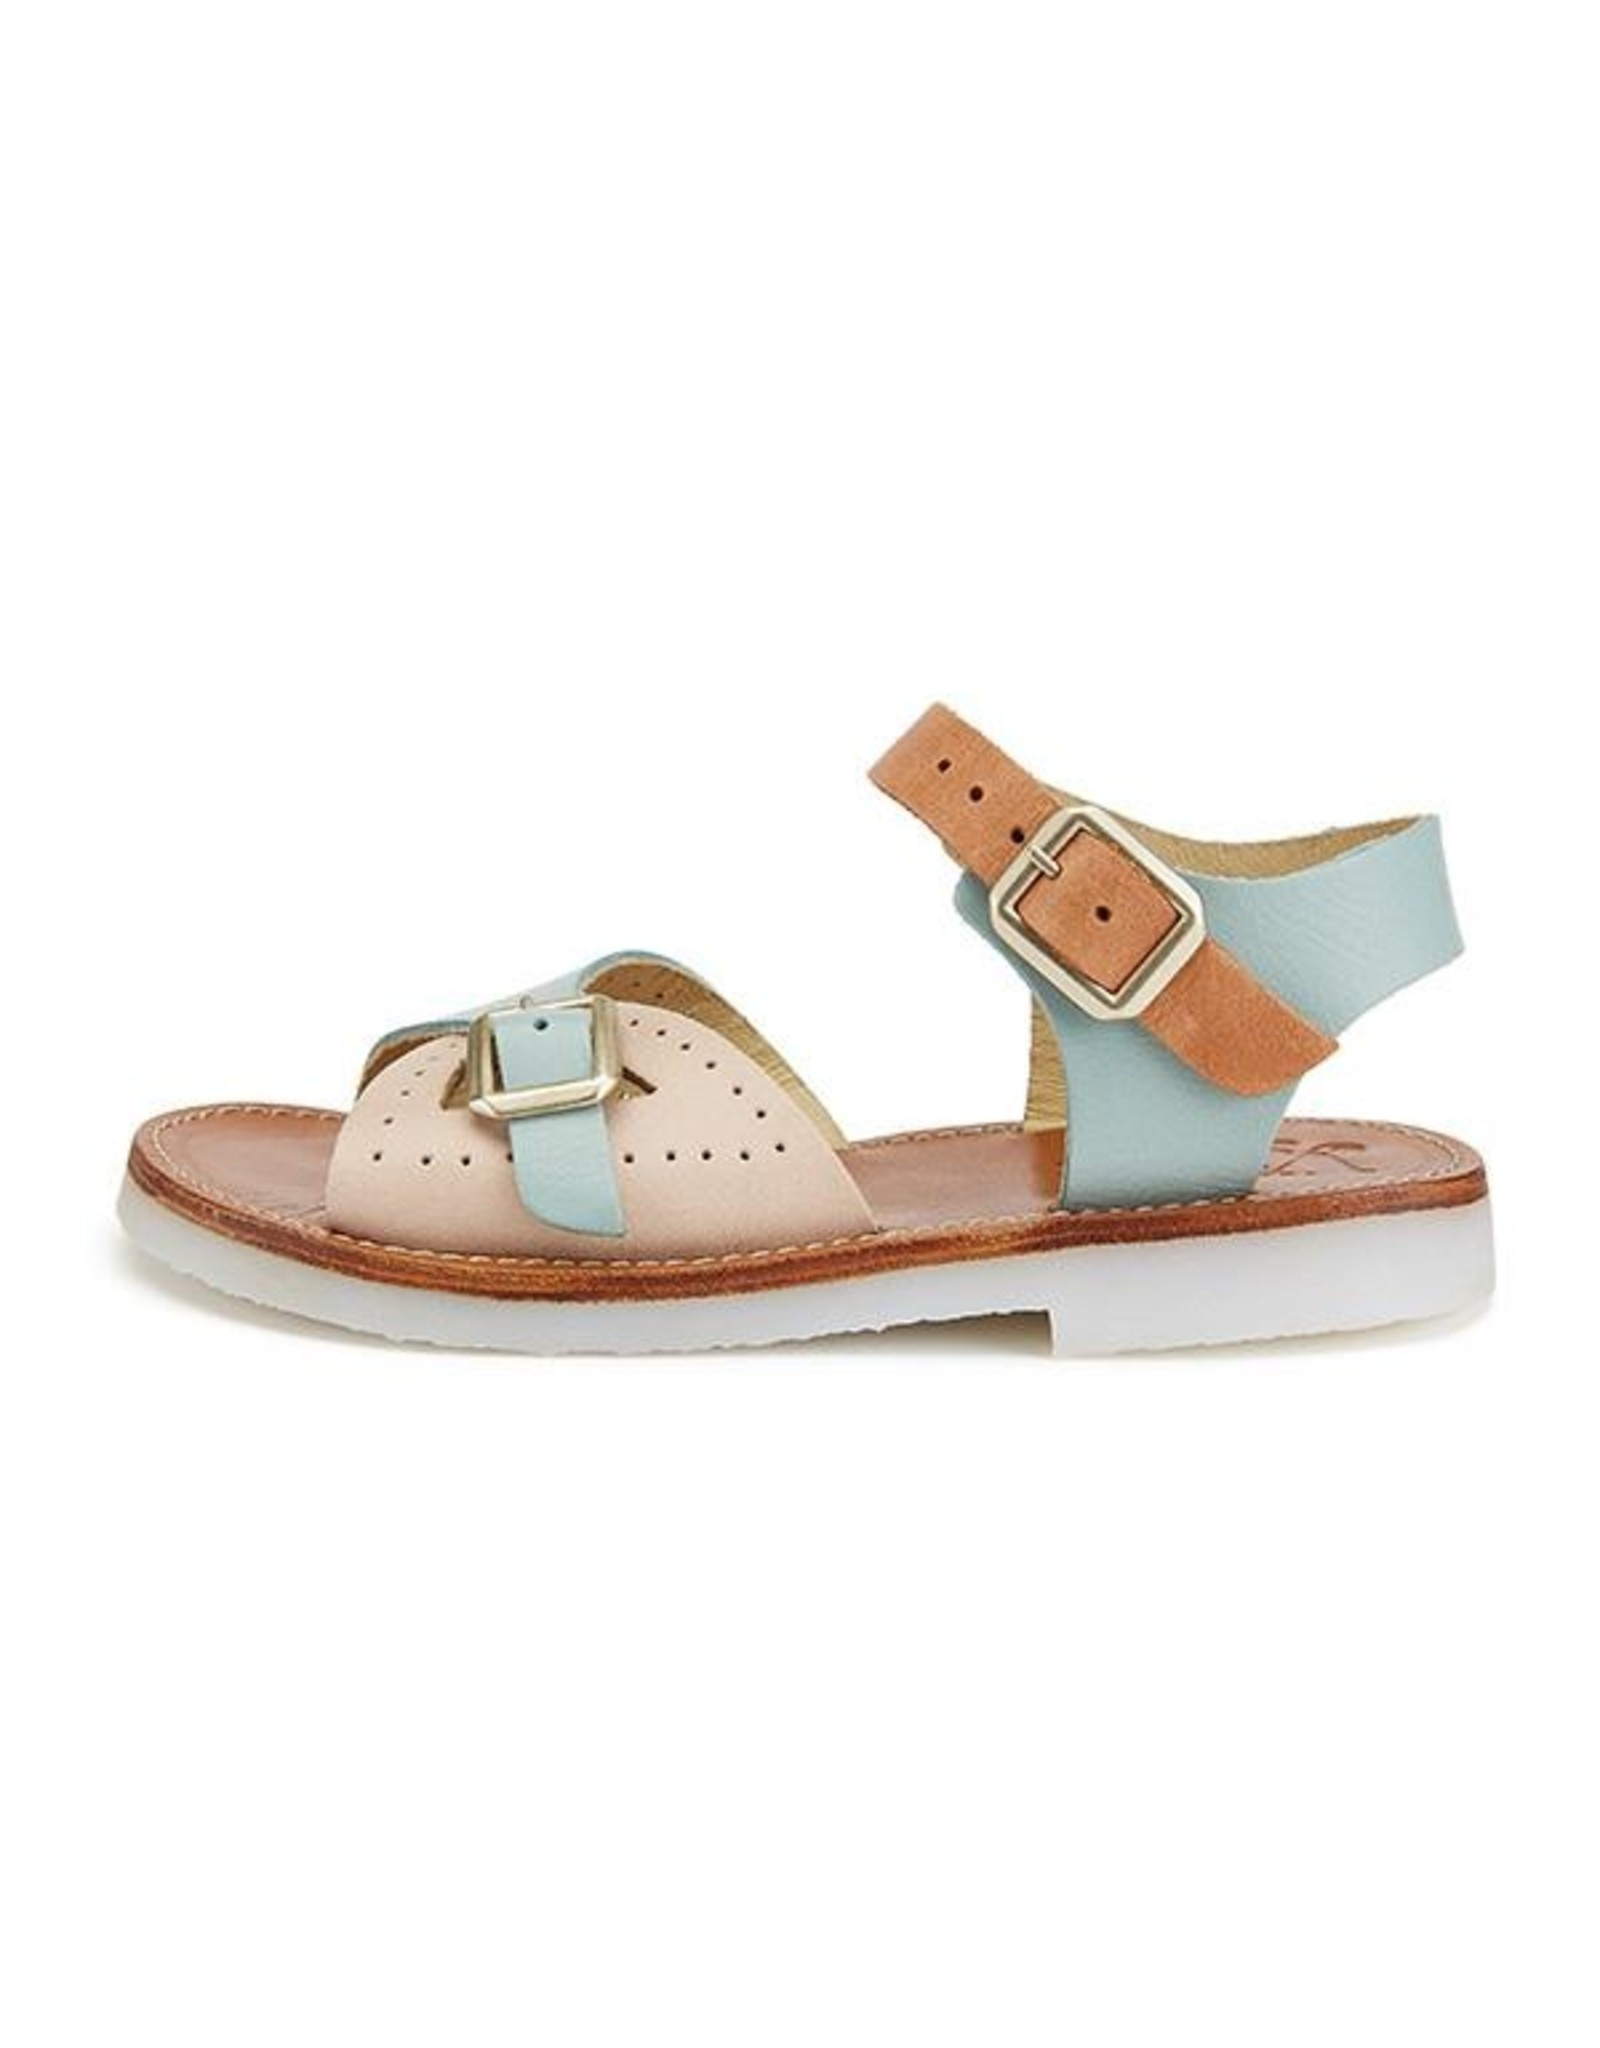 Young Soles Pearl sandal pale multi block